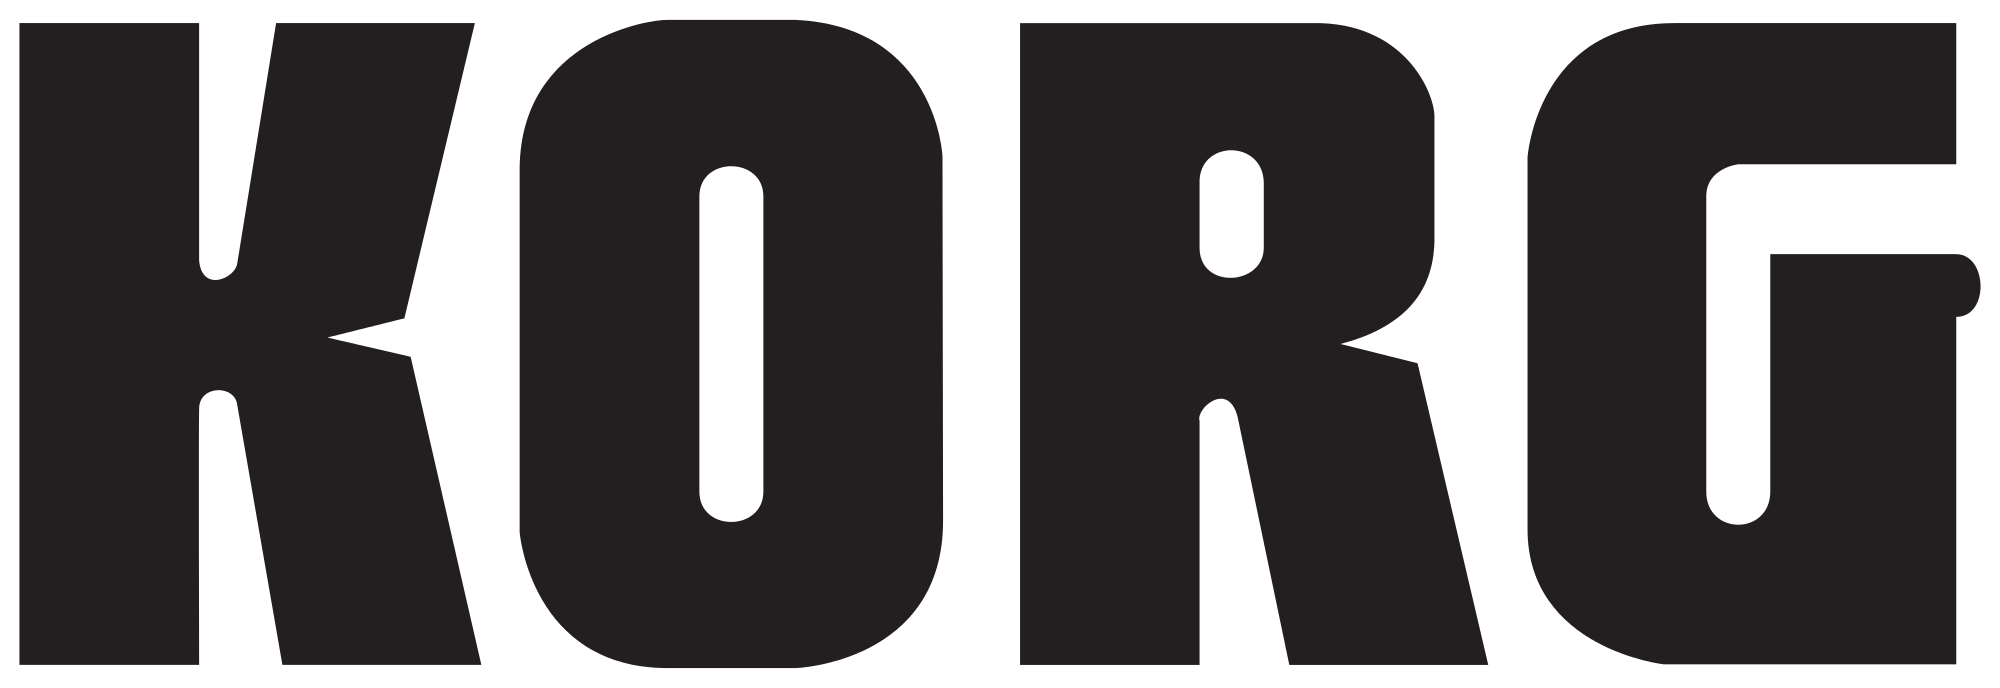 Logo Korg PNG transparente - StickPNG